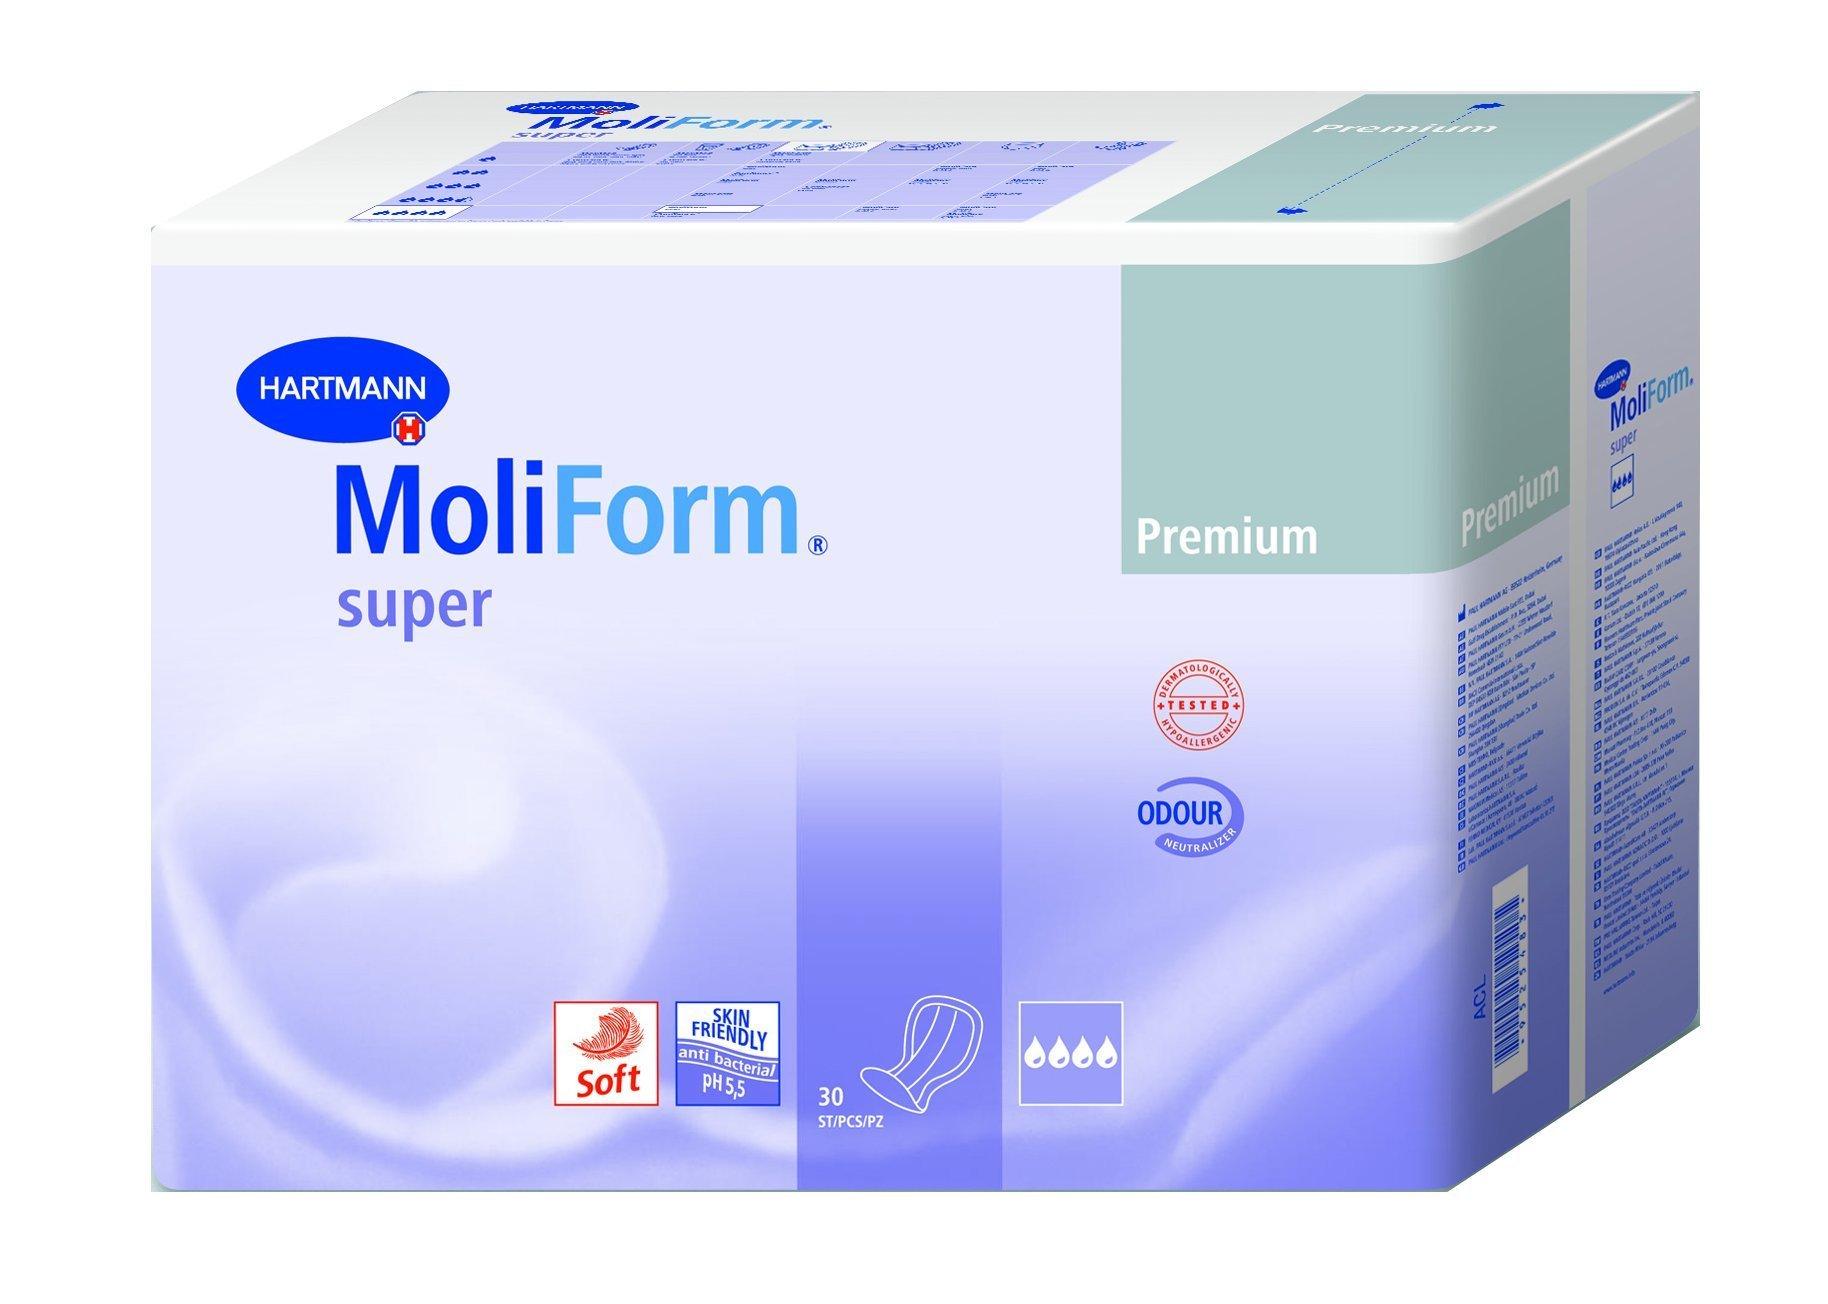 MoliForm Premium Soft Super/Overnight Air Active Liners, Case of 120